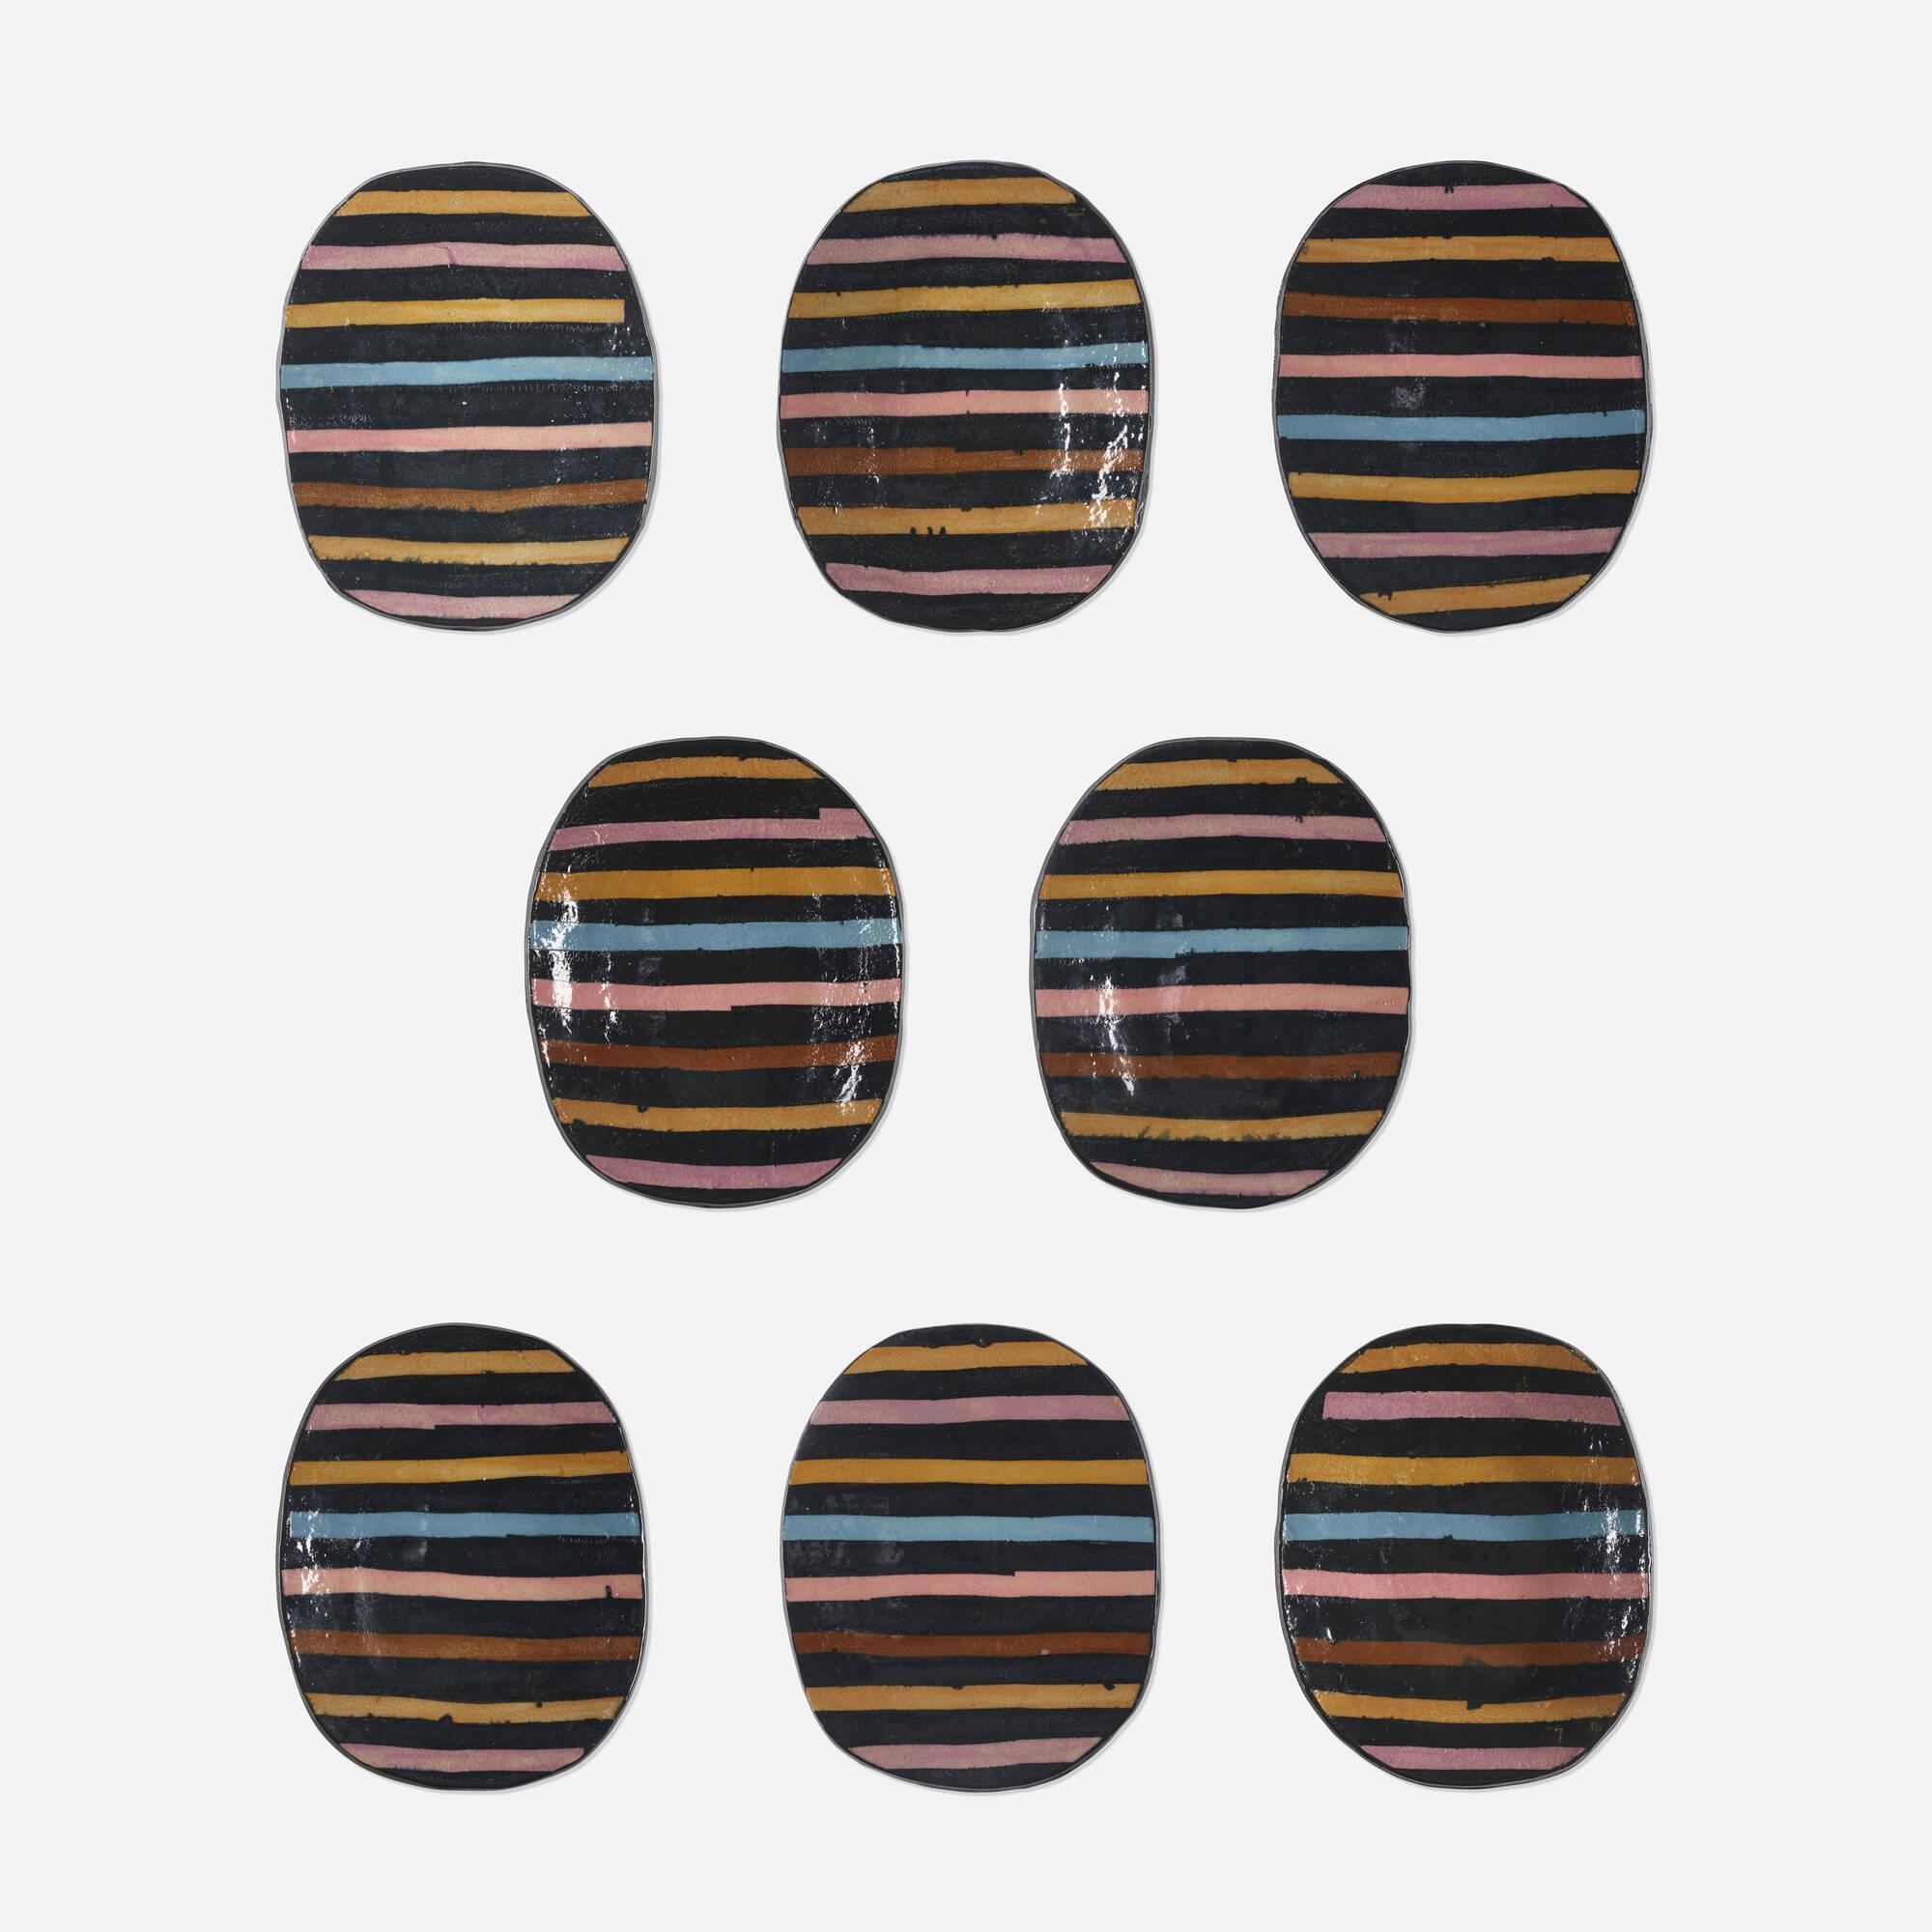 237: Jun Kaneko / Untitled (eight works) (1 of 3)